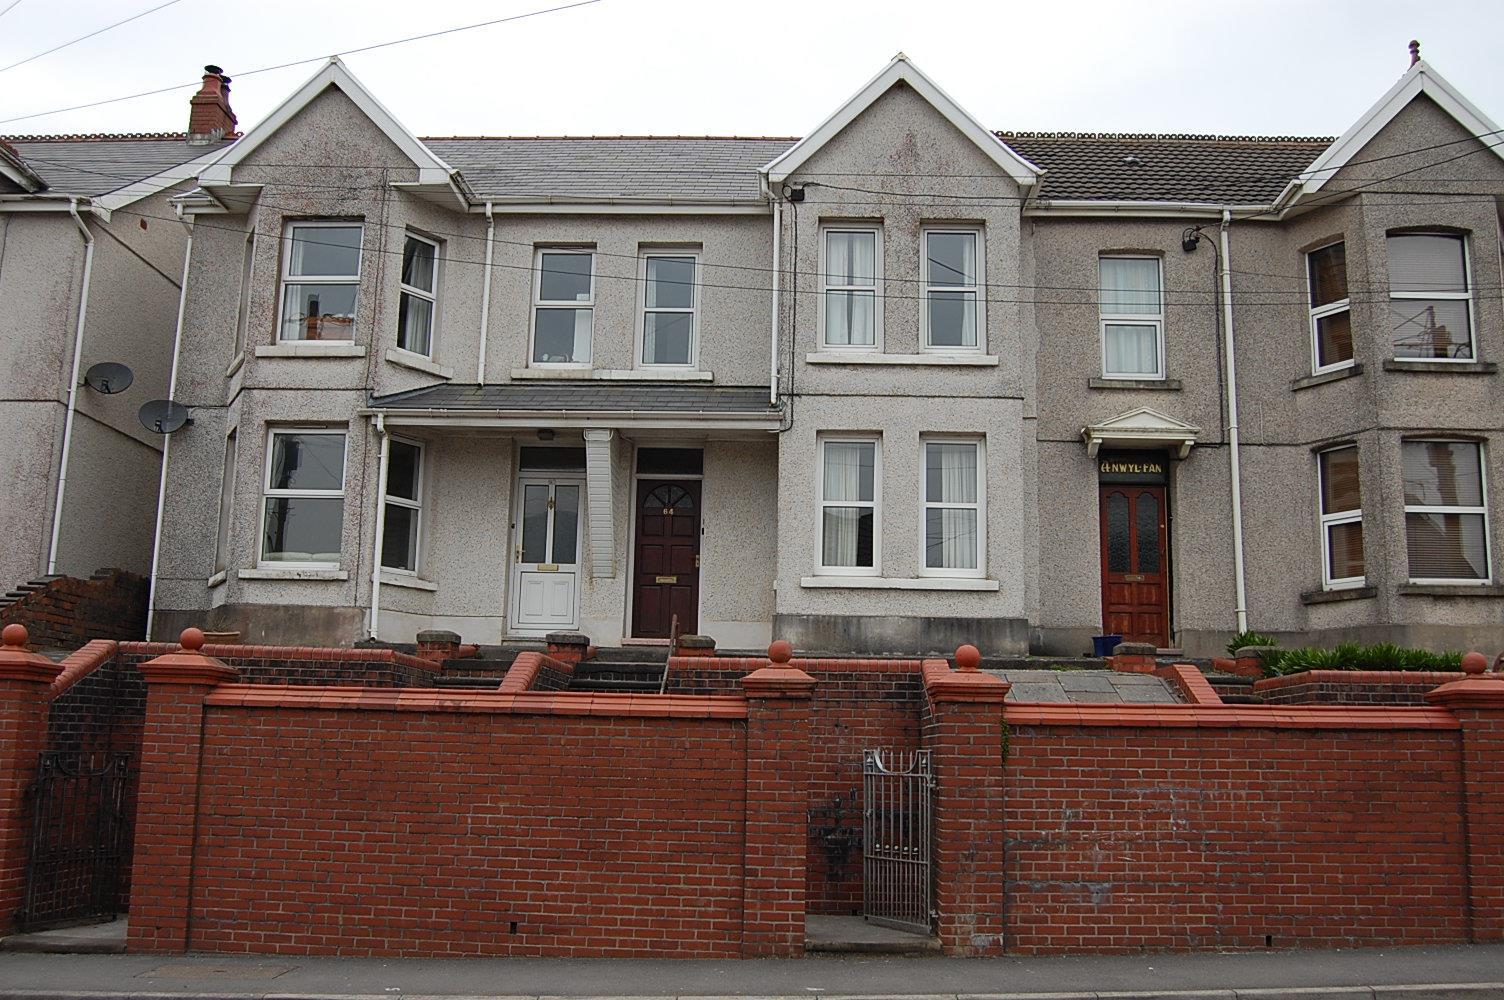 64 High Street, Ammanford, Carmarthenshire